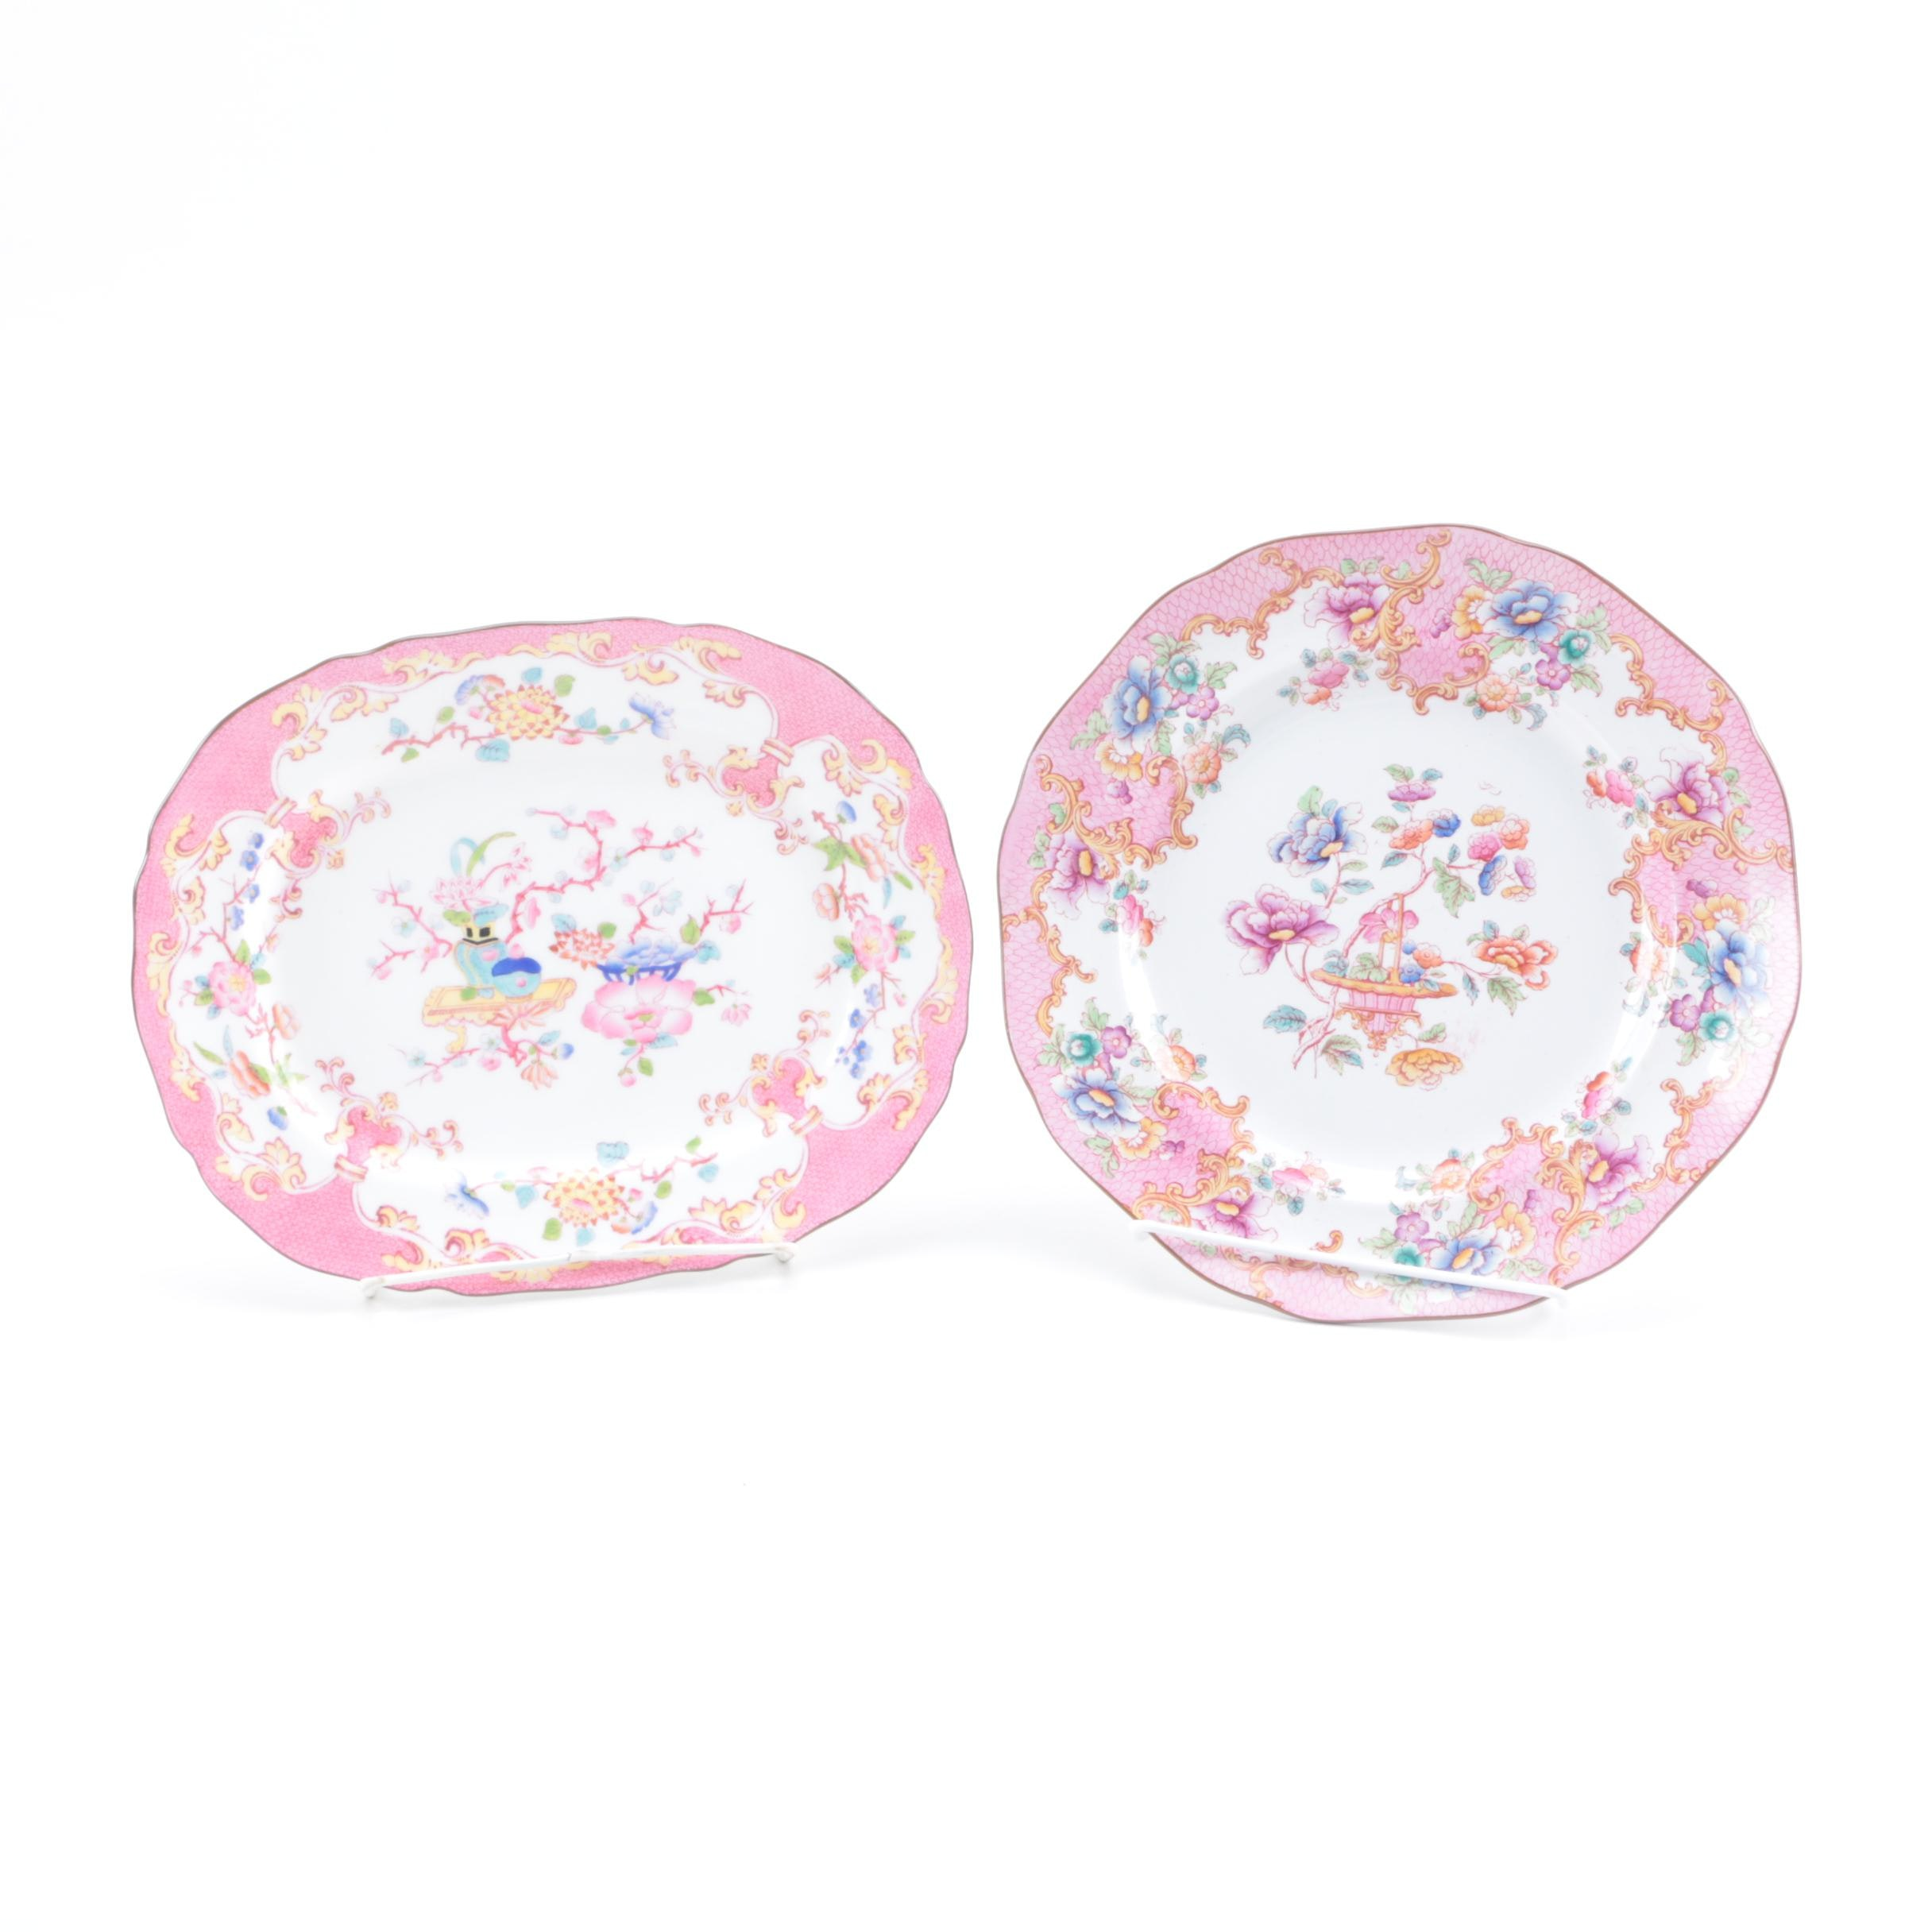 Pair of Decorative Porcelain Plates Including Mintons